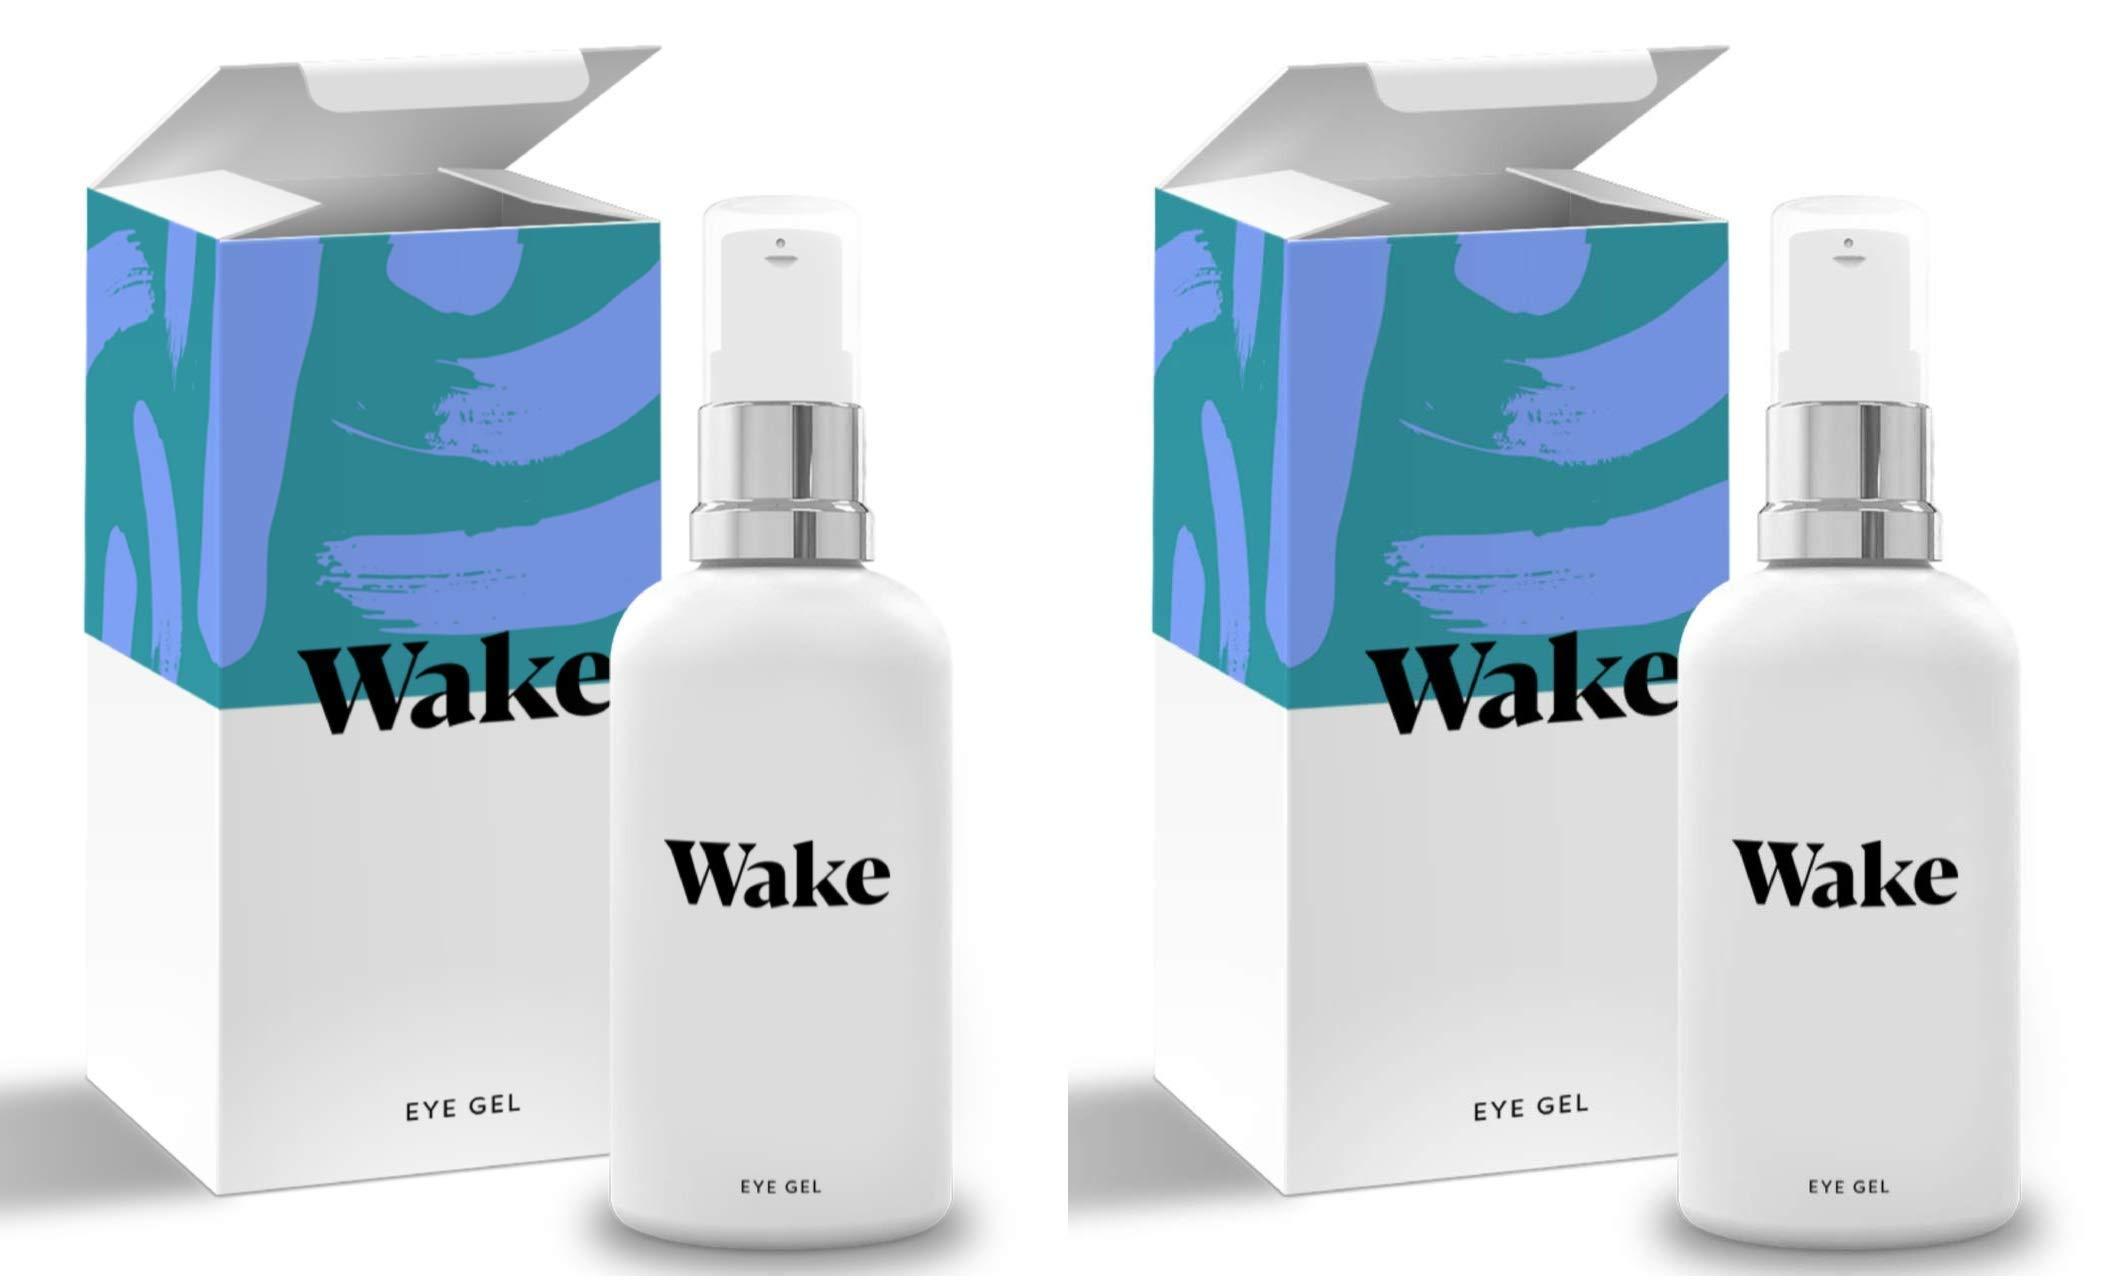 Wake Skincare Eye Gel - Hydrating Eye Serum for Puffy Eyes, Dark Circles, Eye Bags, Crows Feet and Wrinkles - Vitamin E - Collagen - 30ml Anti Ageing Eye Cream (2 Pack) by Wake (Image #1)